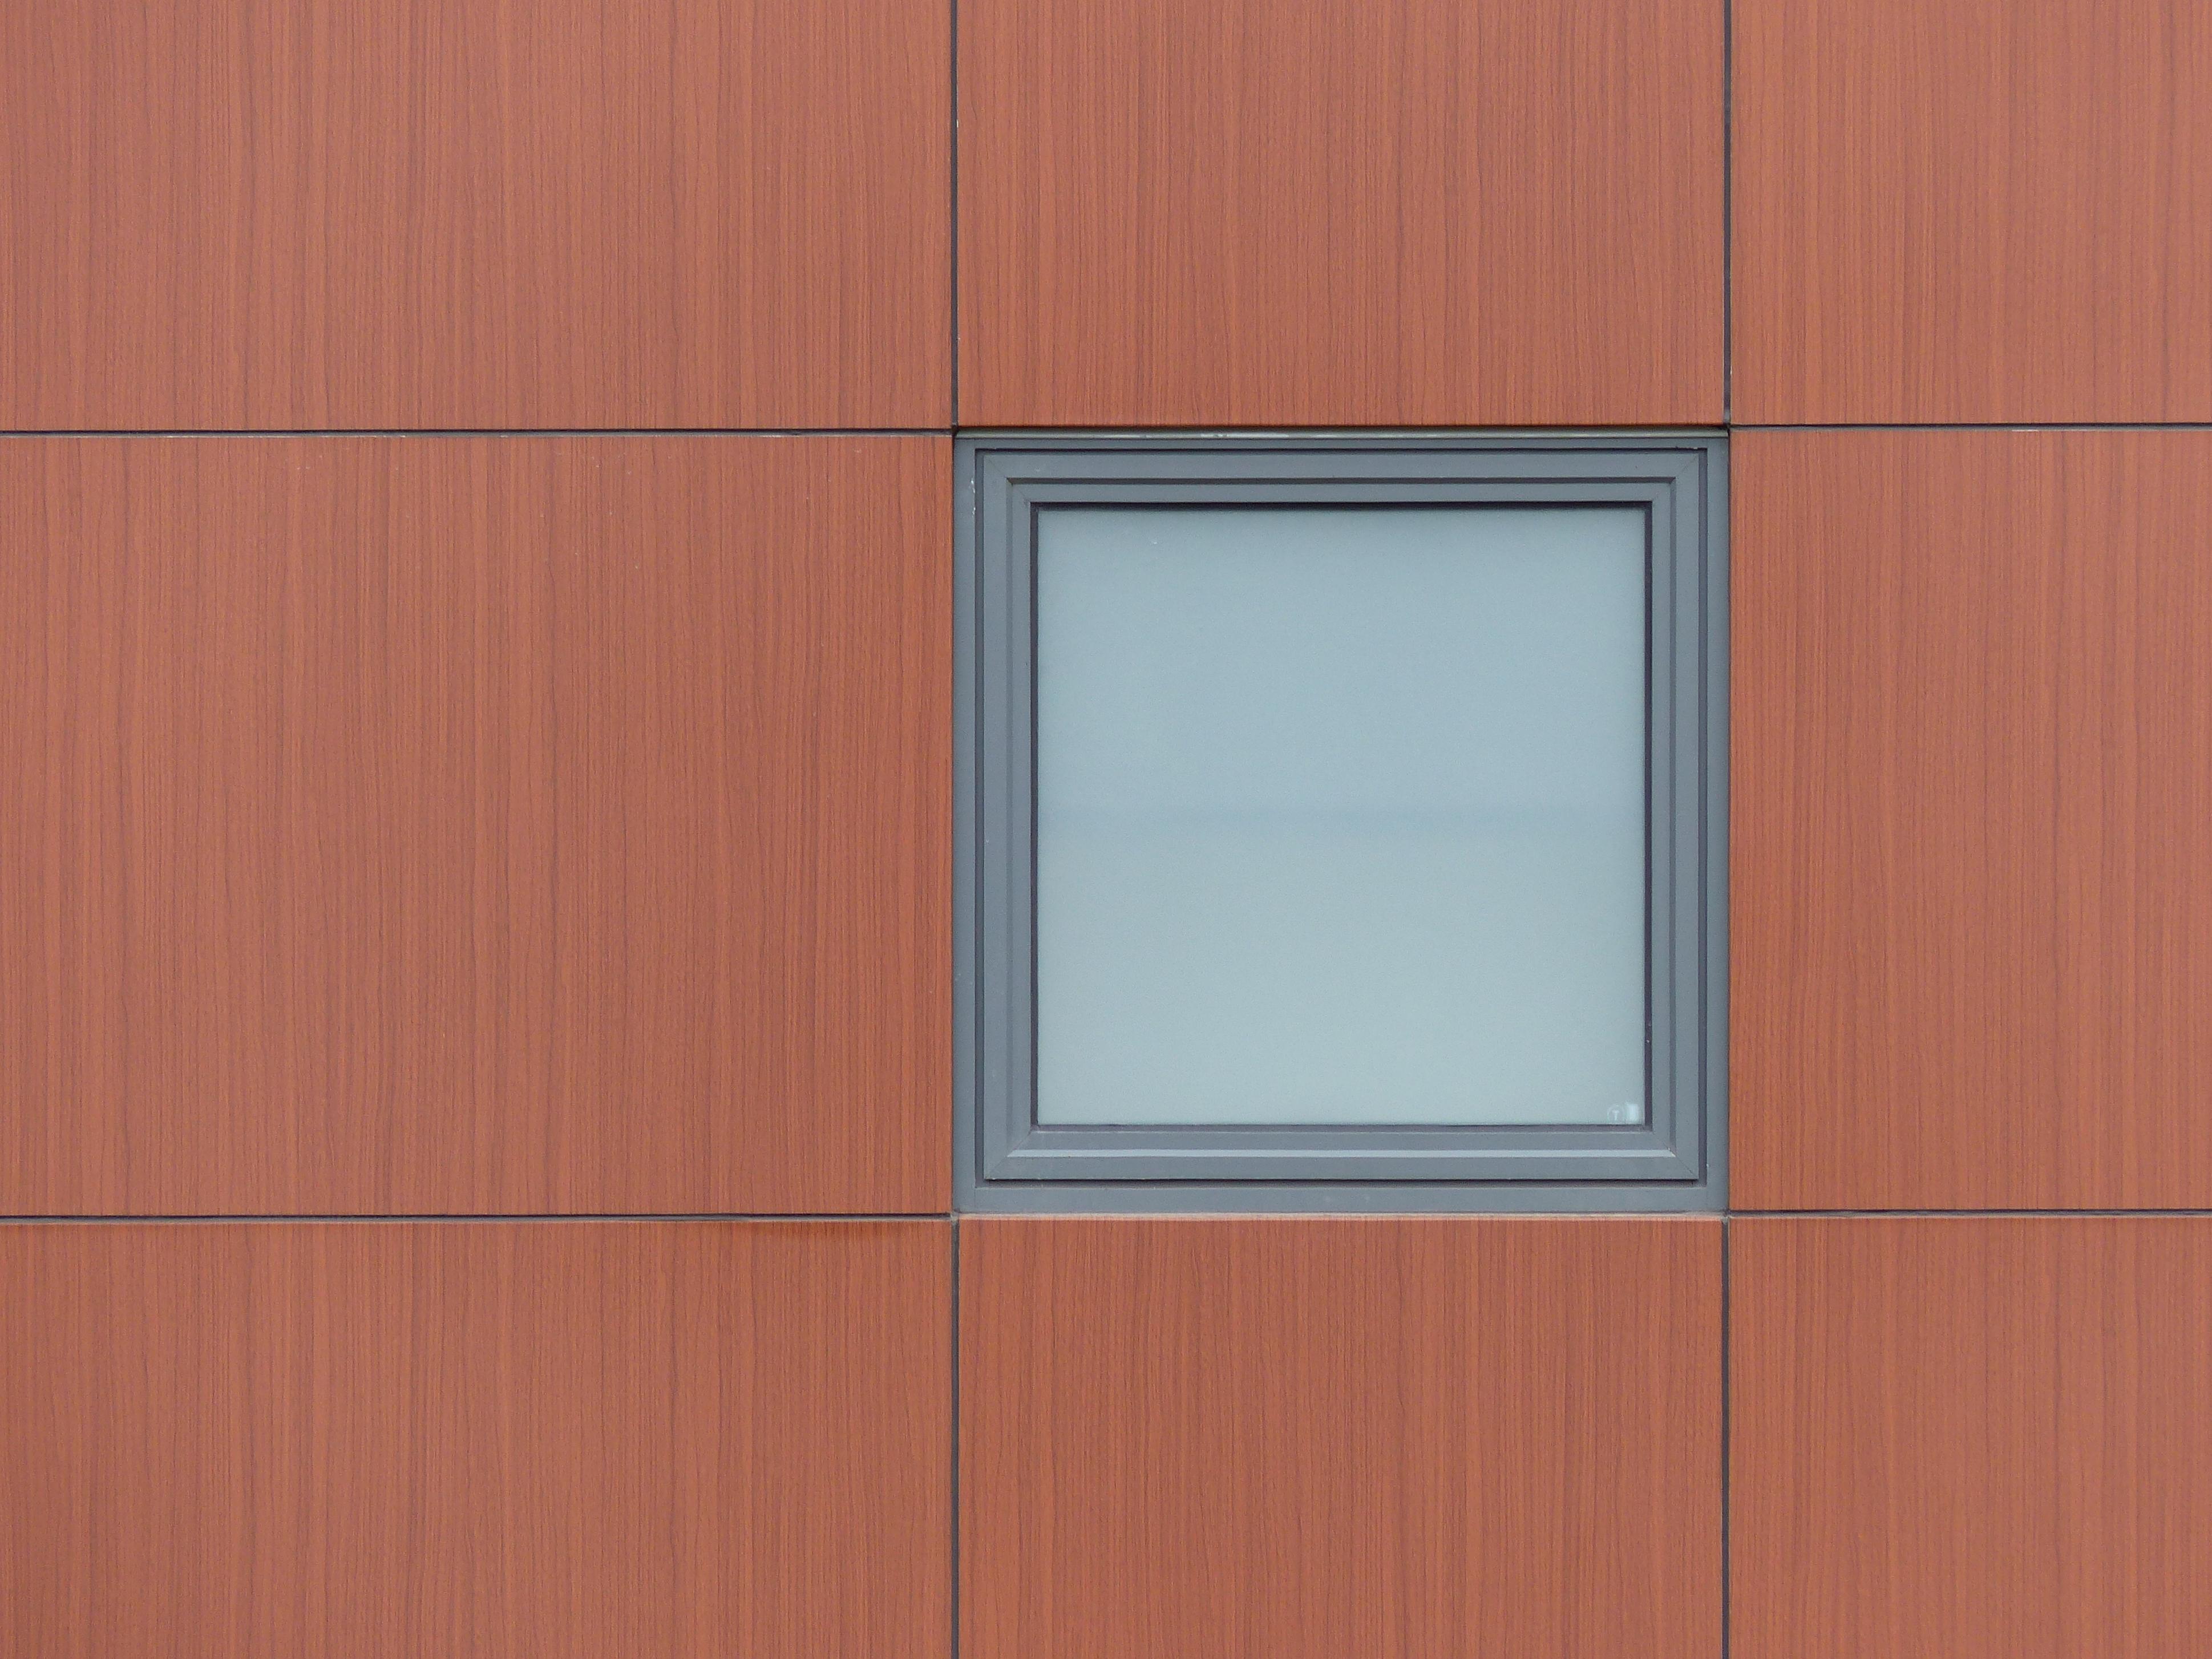 Wallpaper Jendela Kotak Sederhana Hww Windowwednesdays